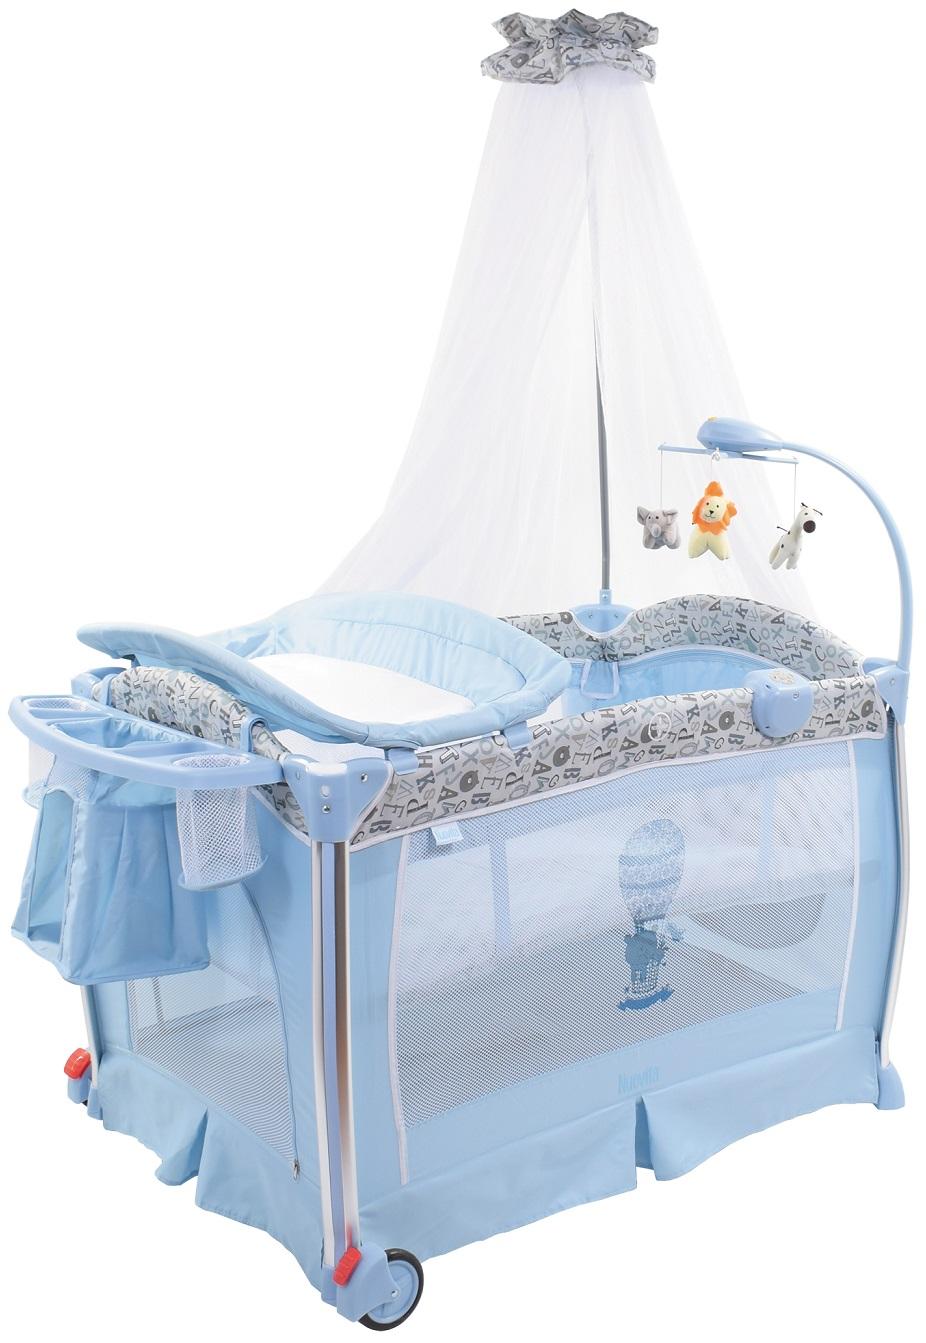 Детская кровать-манеж Nuovita Fortezza, цвет - Azzurro / ЛазурныйМанежи<br>Детская кровать-манеж Nuovita Fortezza, цвет - Azzurro / Лазурный<br>